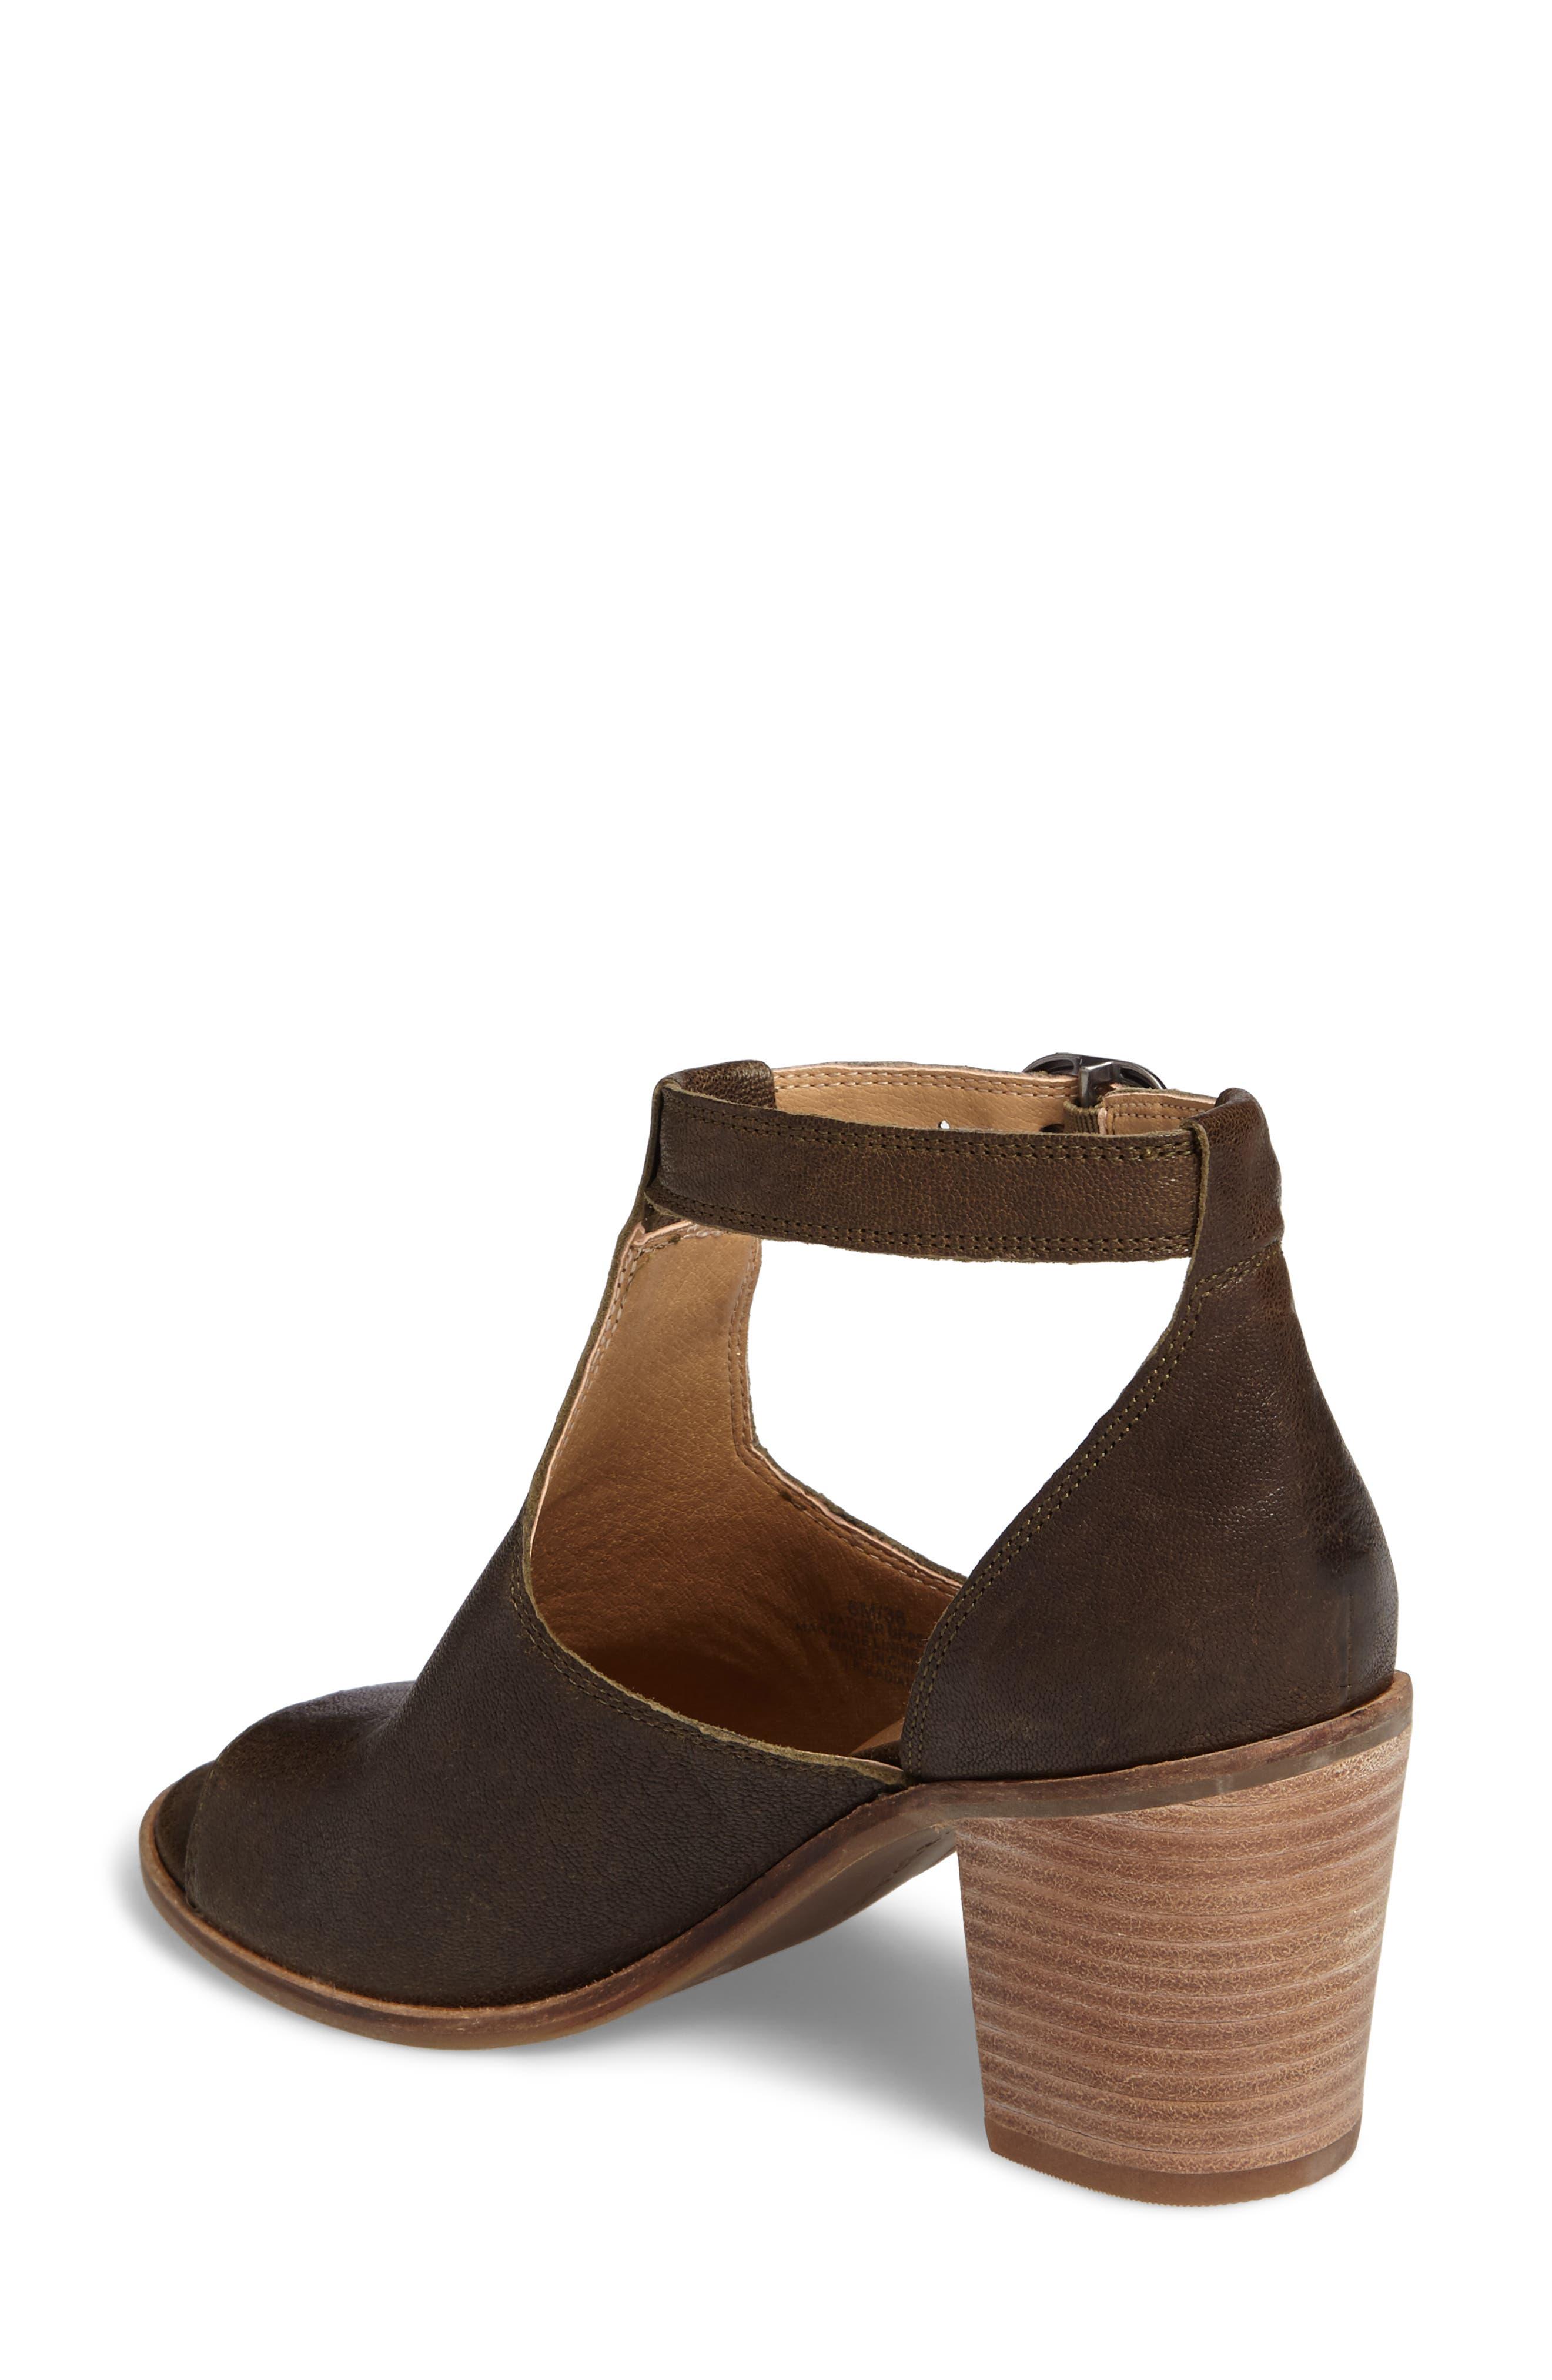 Kadian Block Heel Sandal,                             Alternate thumbnail 4, color,